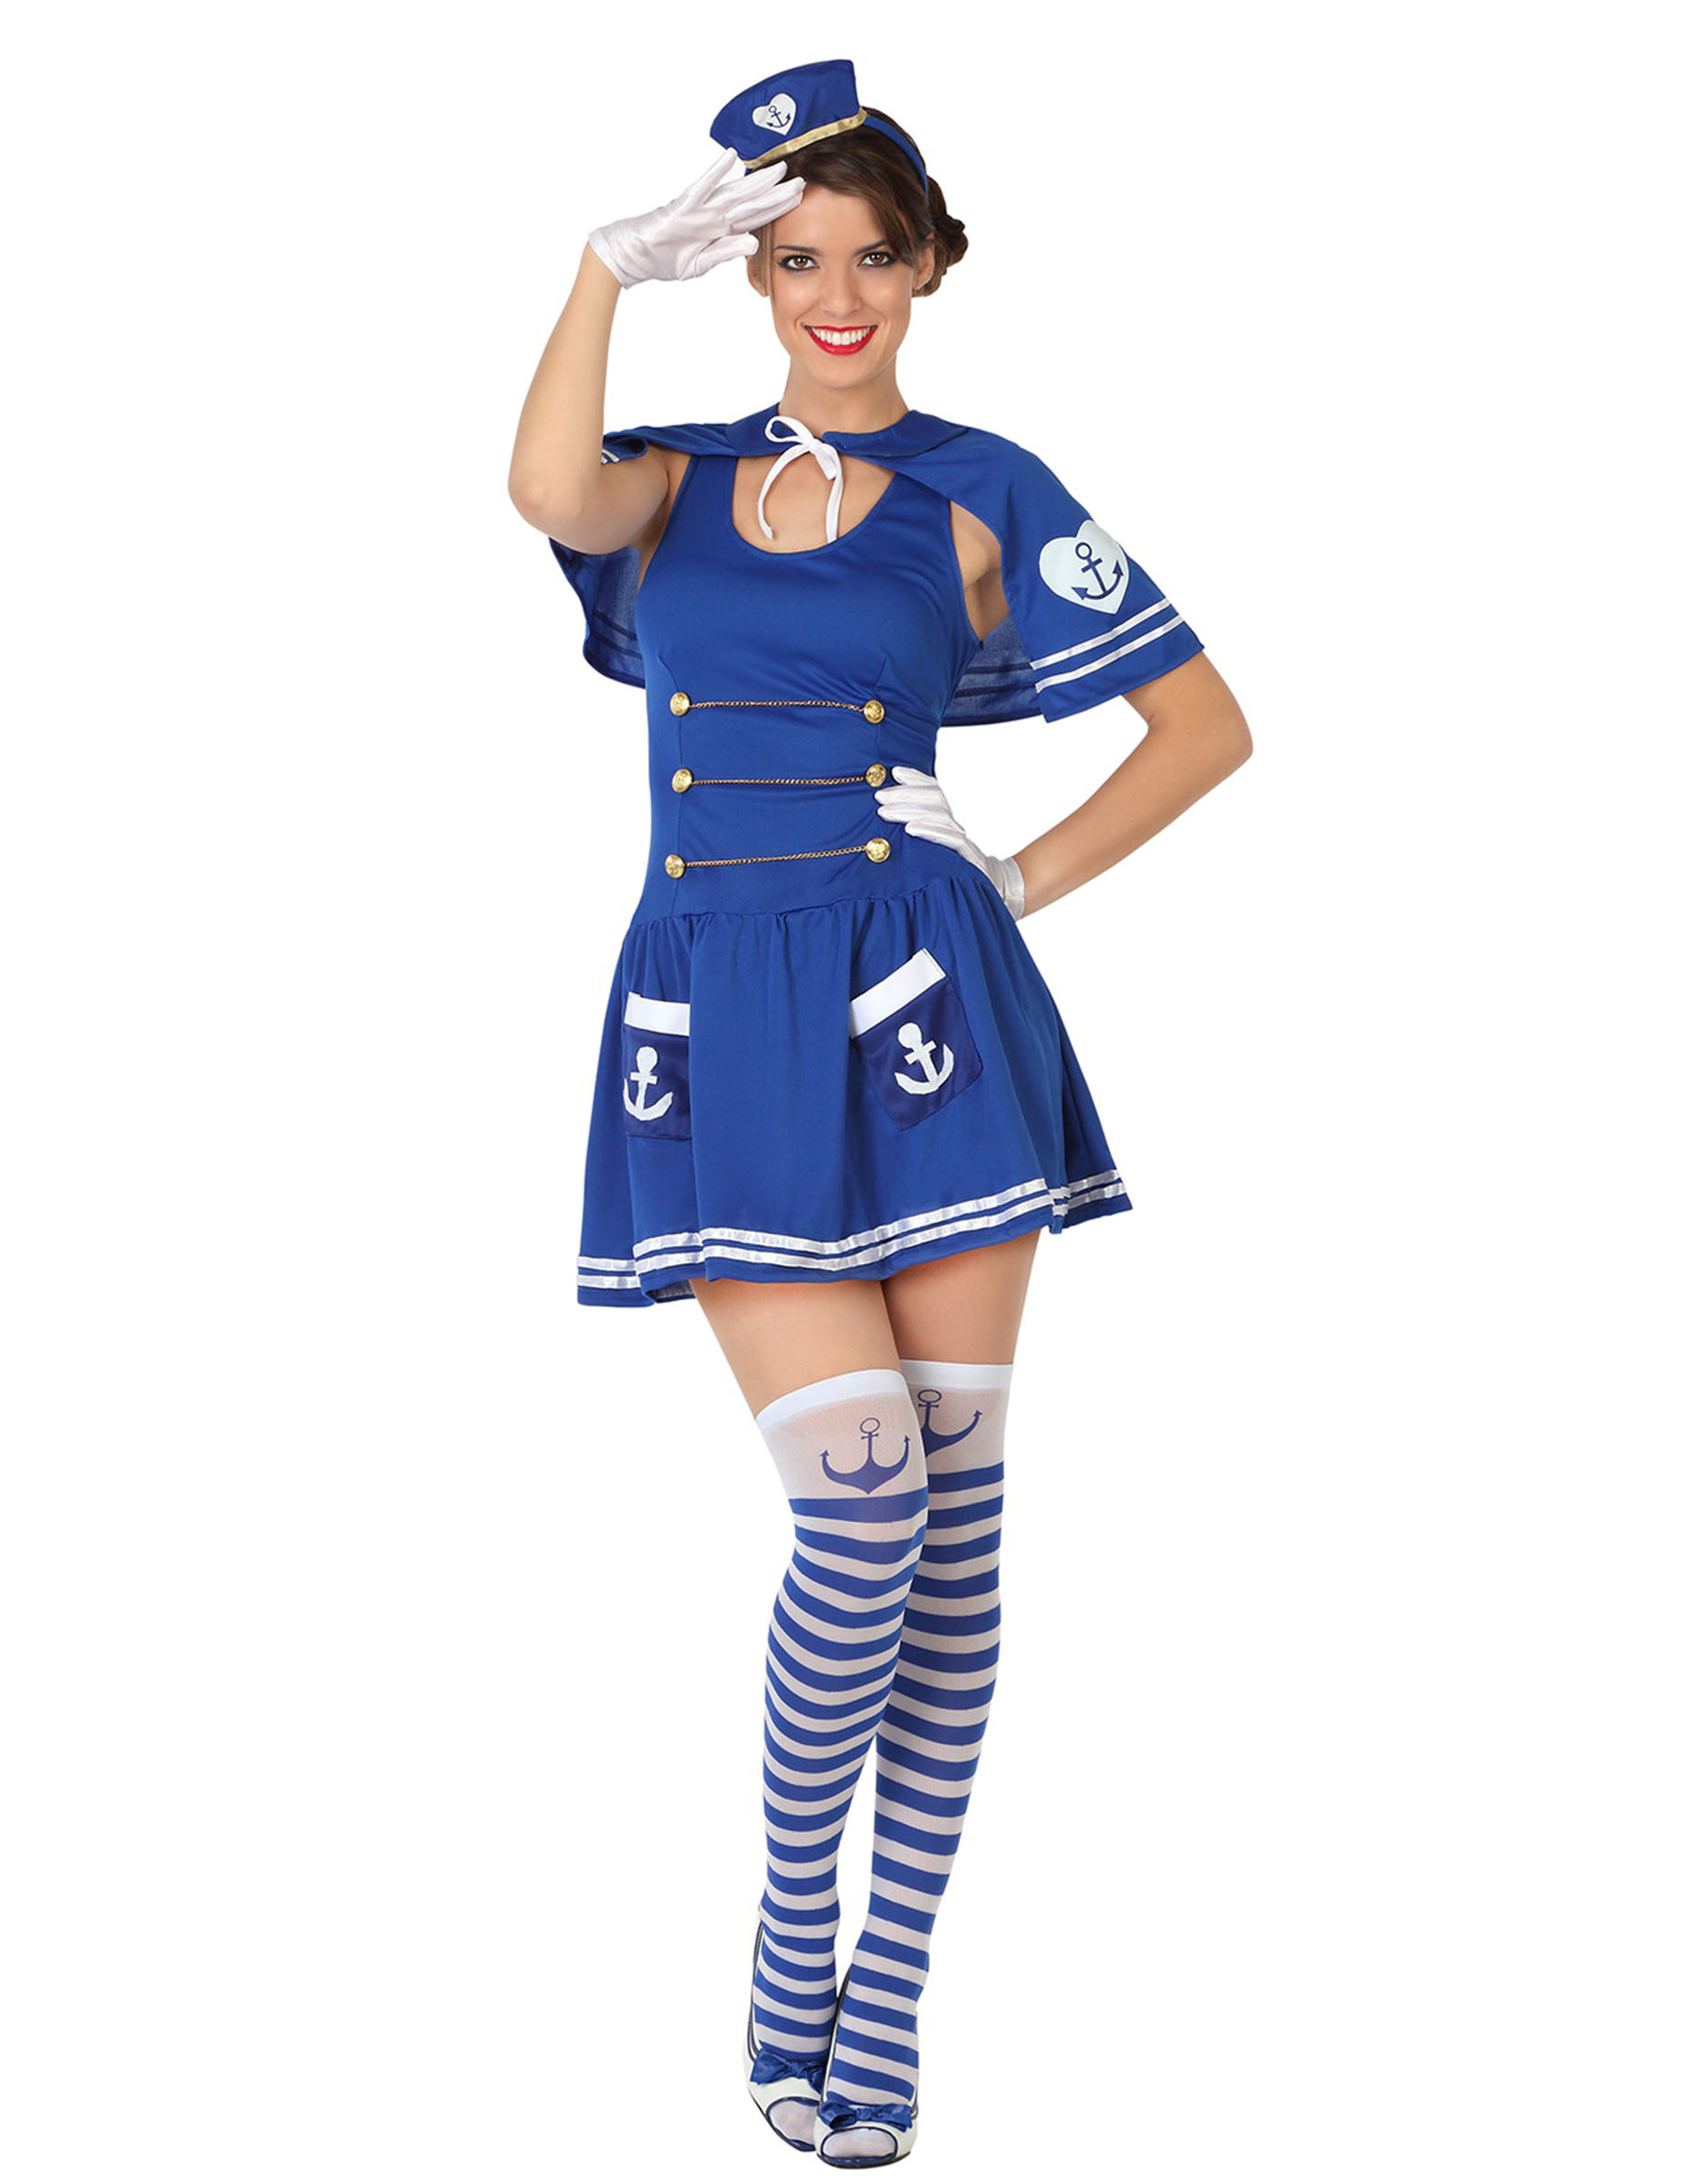 sømands kostume dame